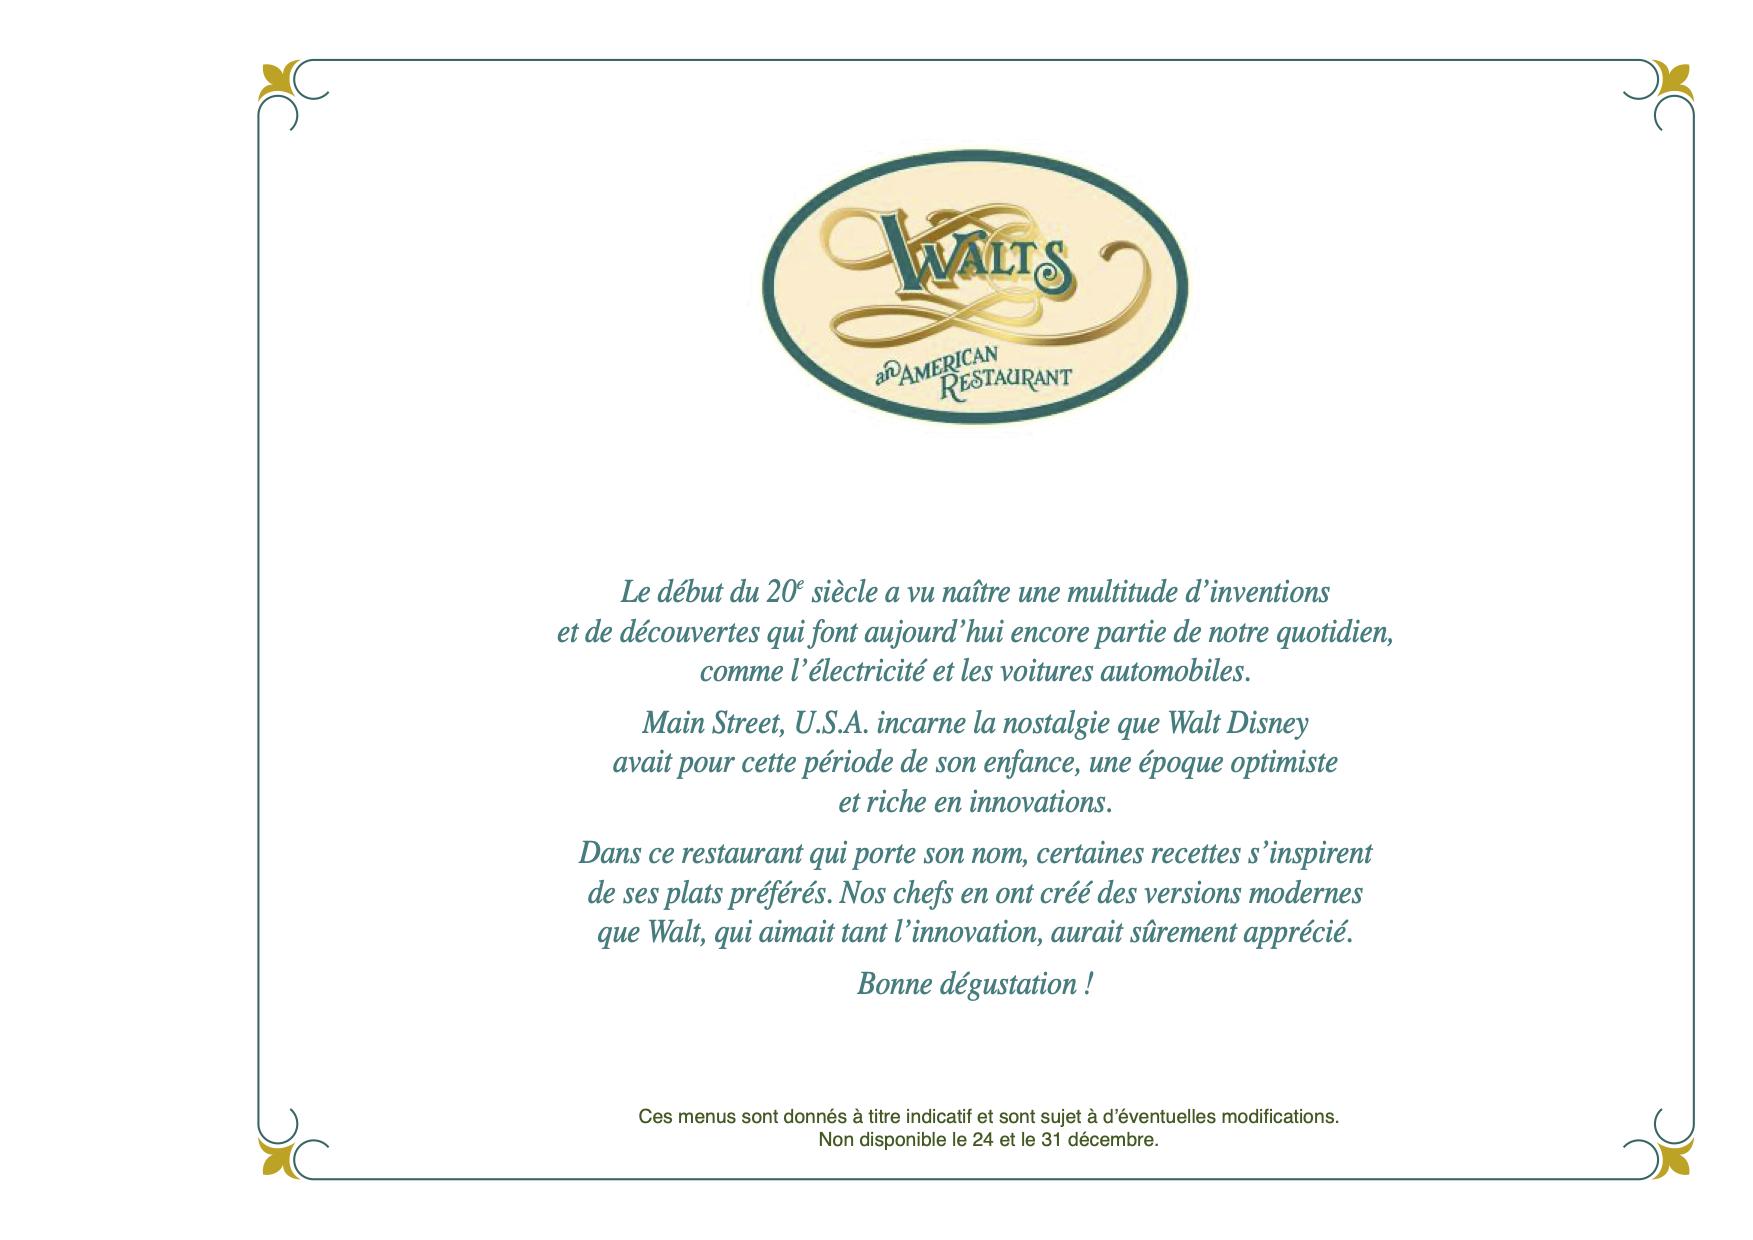 P1MR10_walts-american-restaurant1